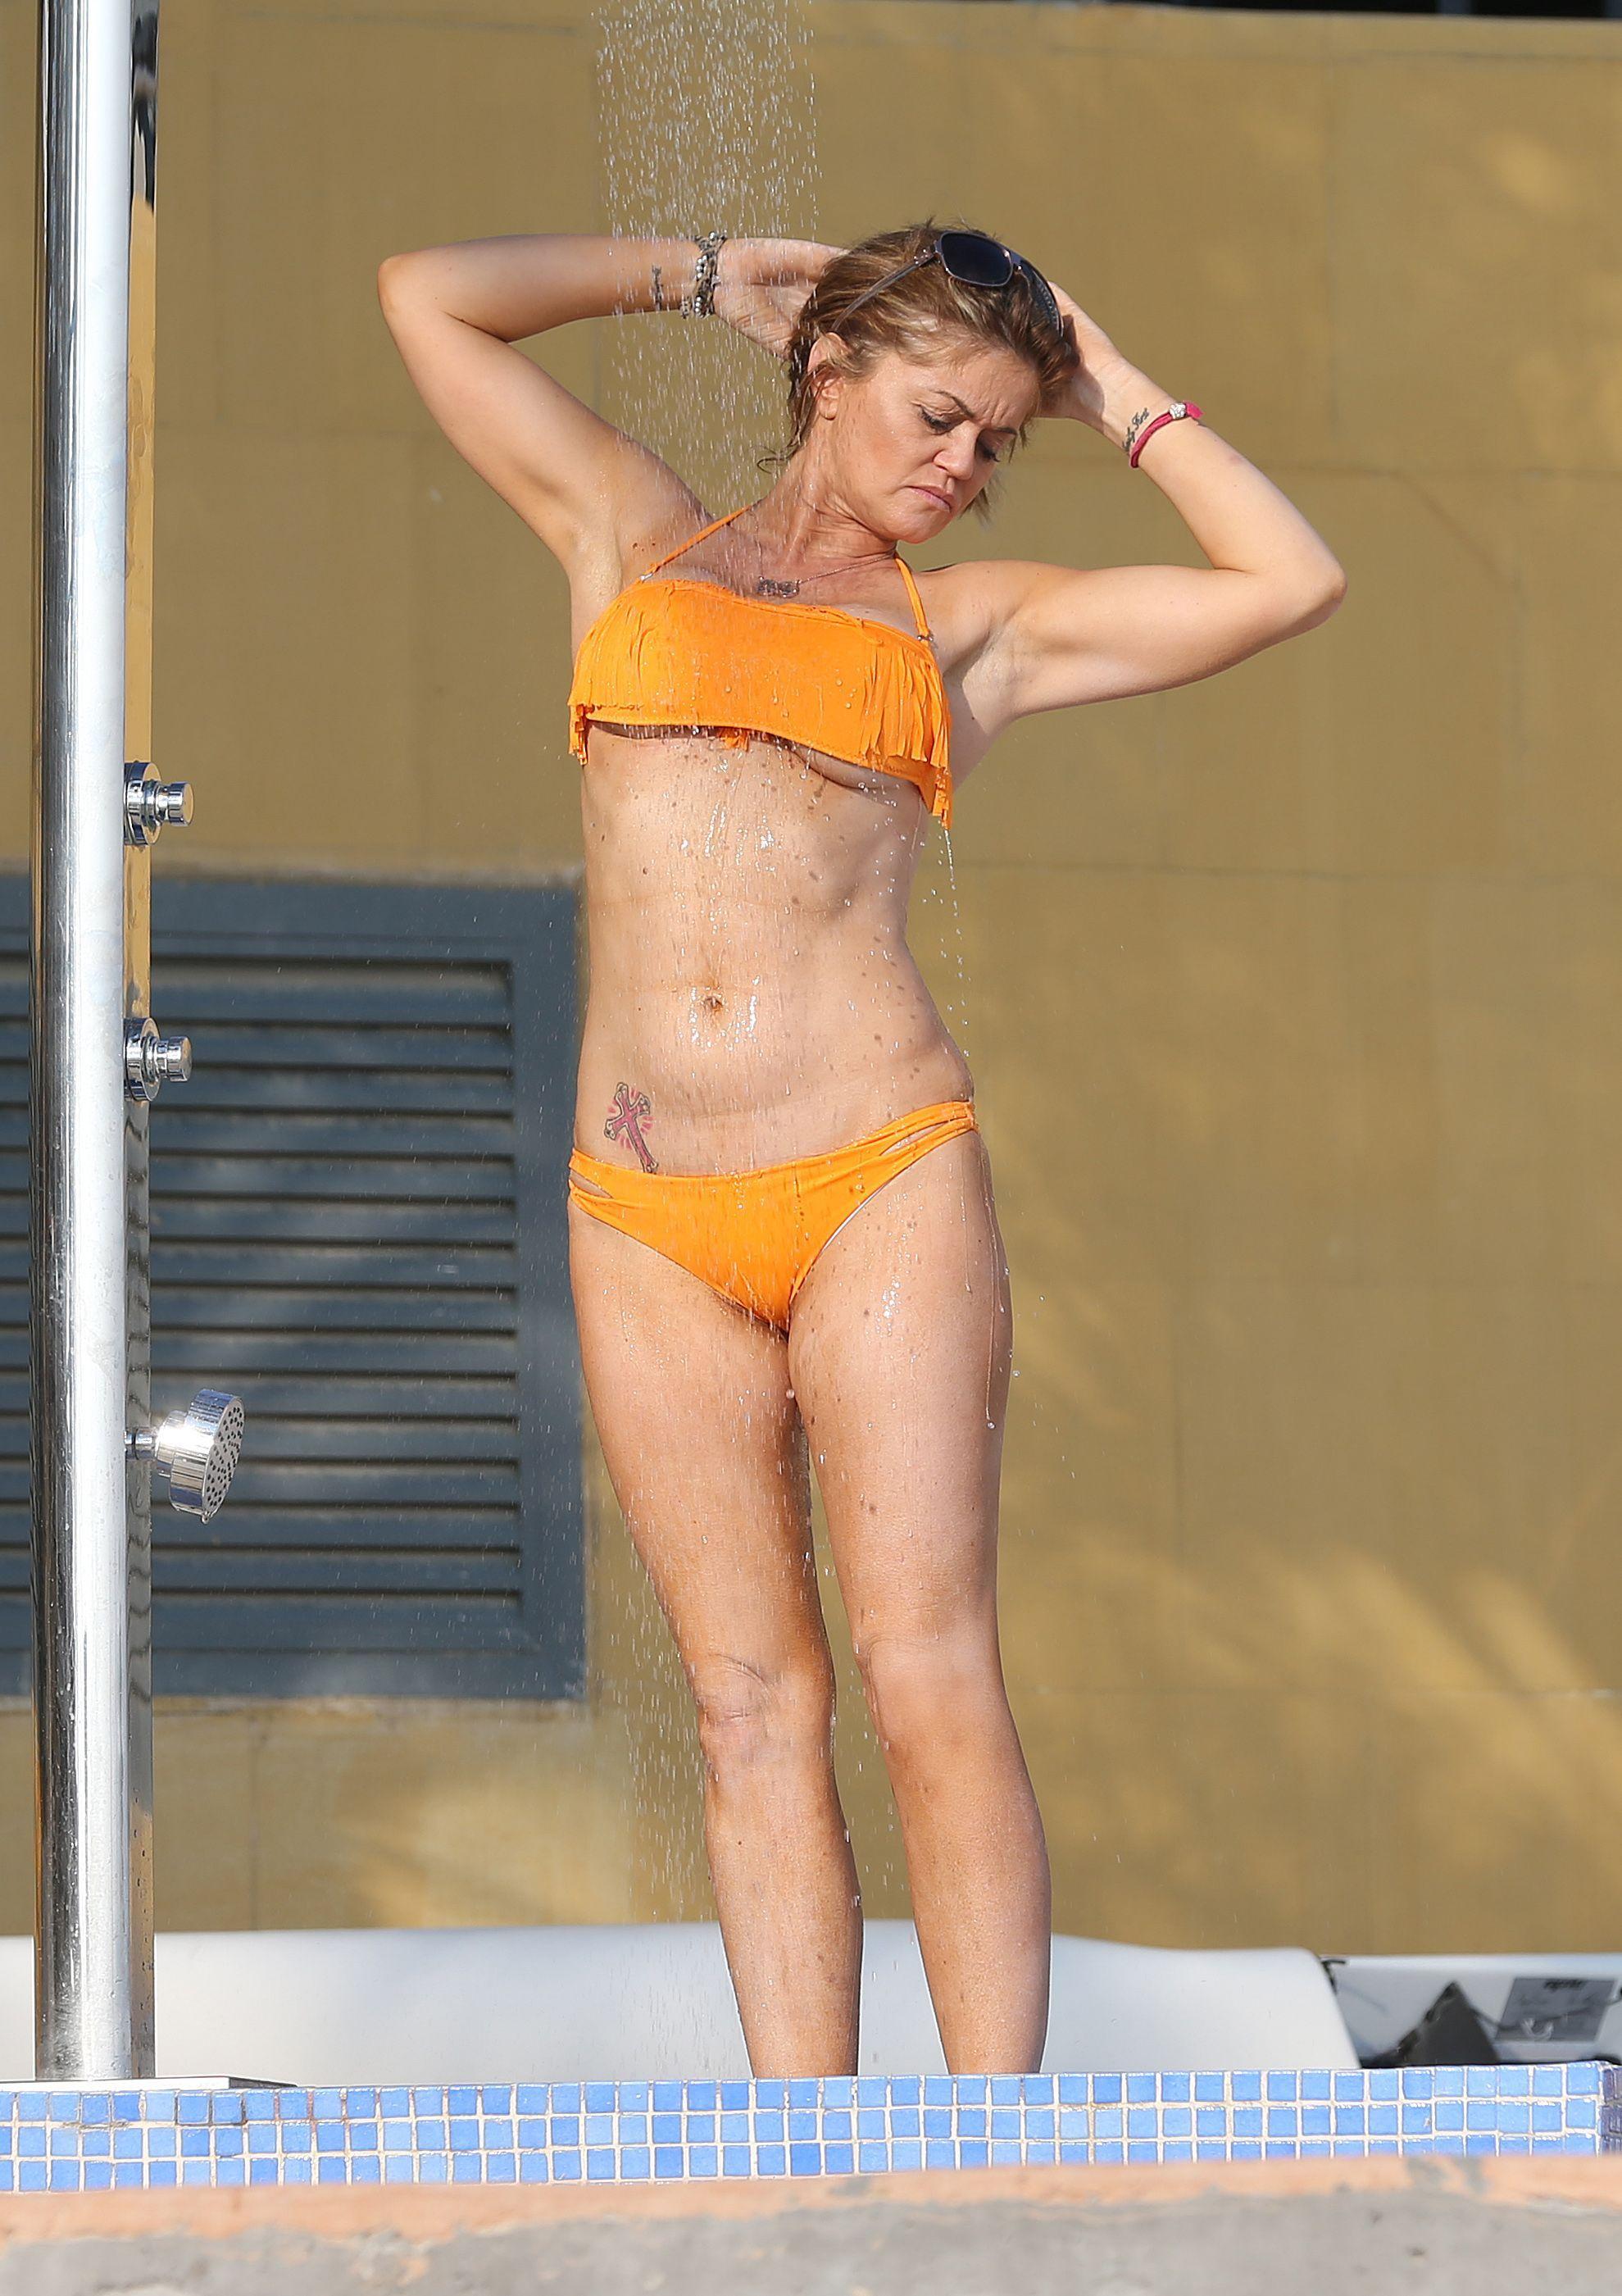 Foto Alexandra Daddario naked (43 photos), Tits, Is a cute, Feet, panties 2006